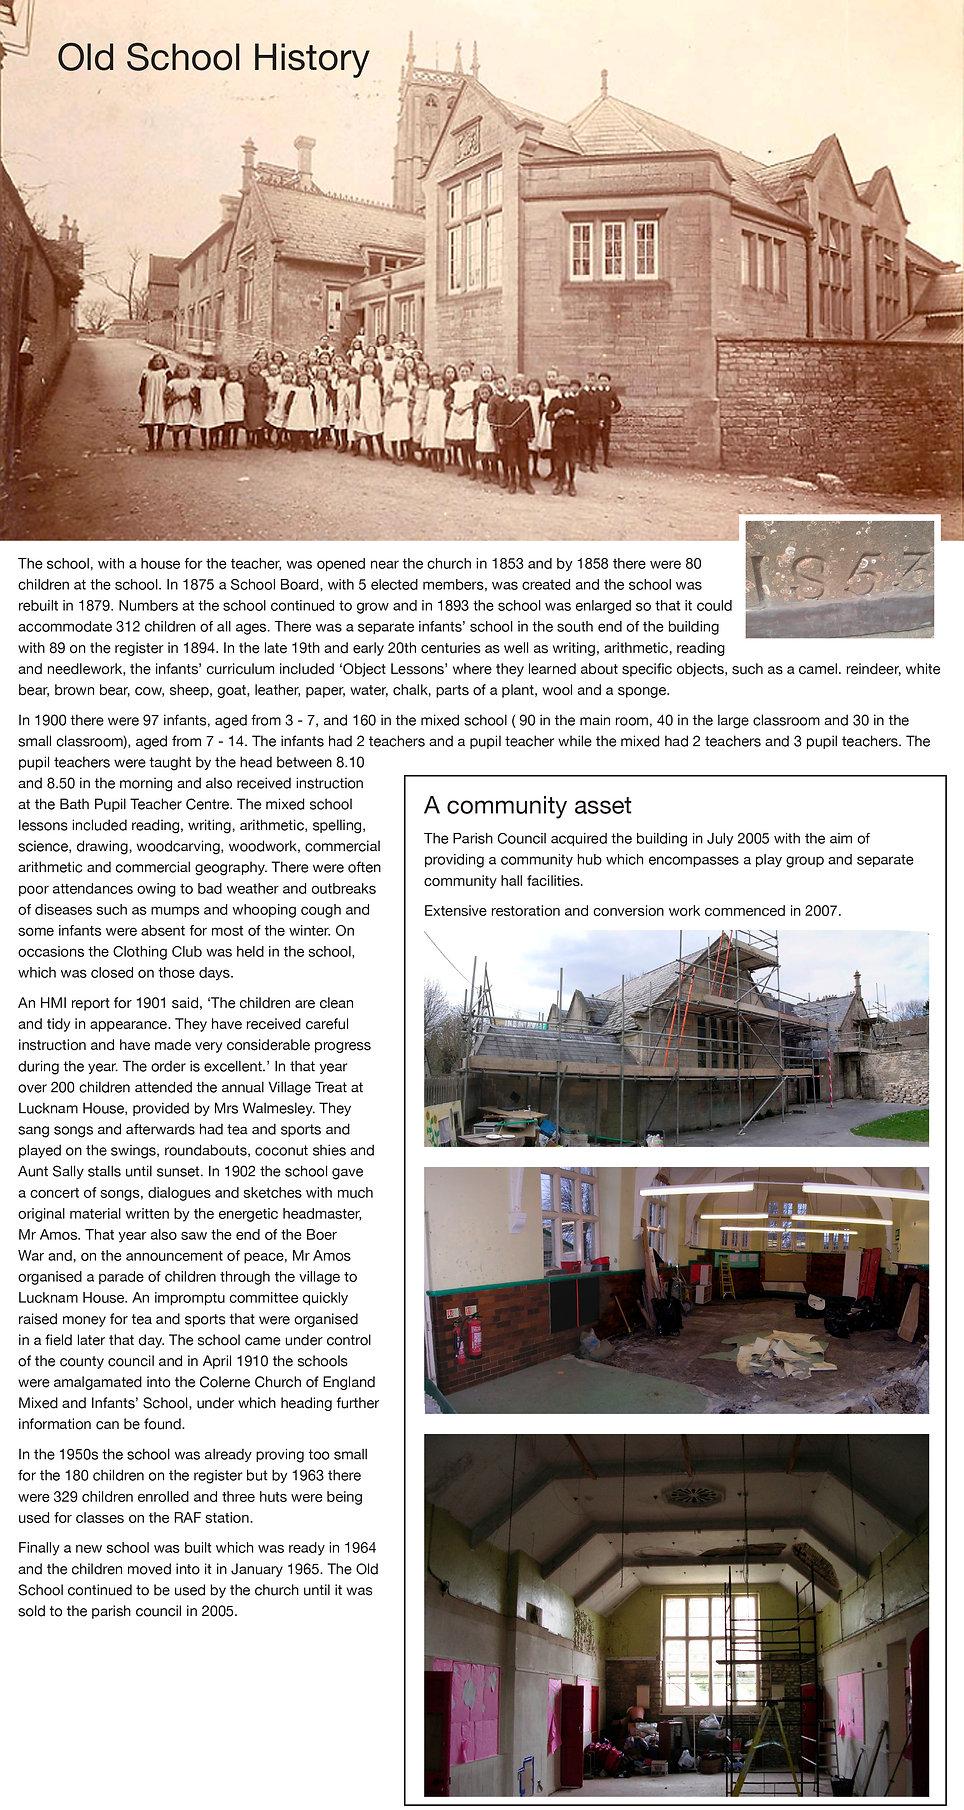 Old School History.jpg